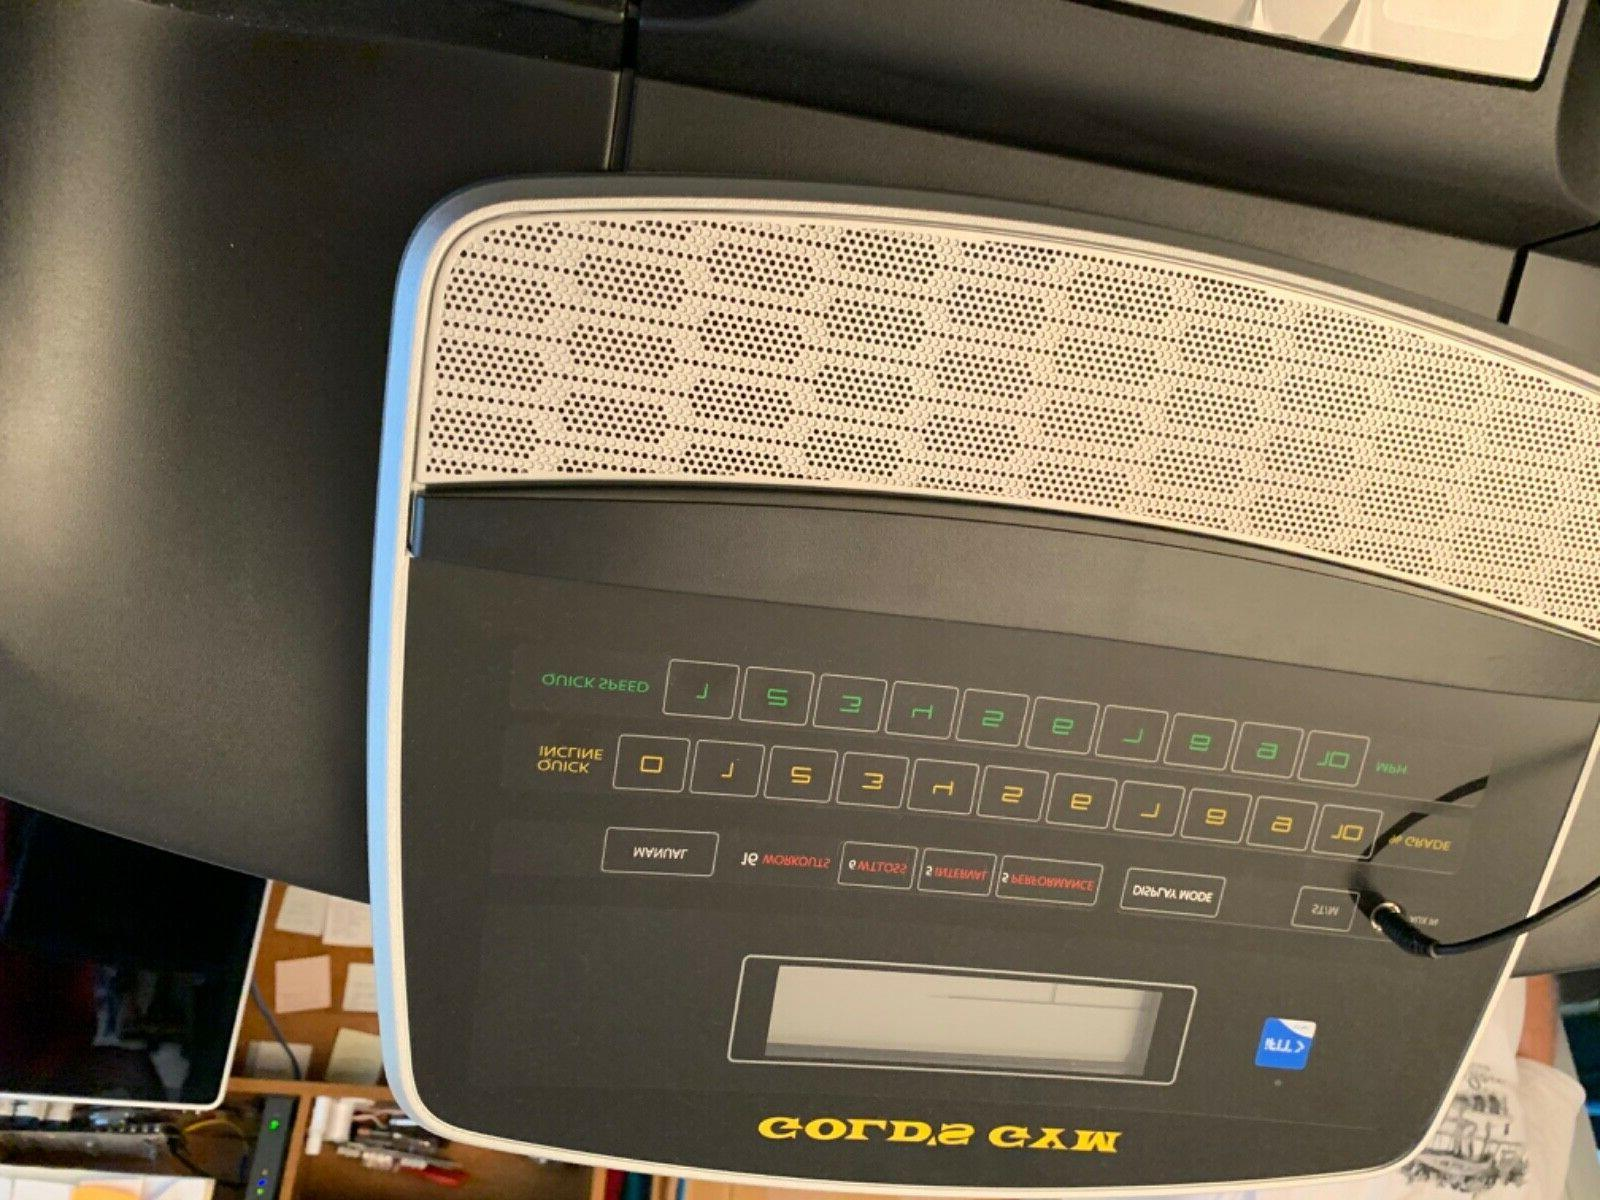 Golds gym 430i